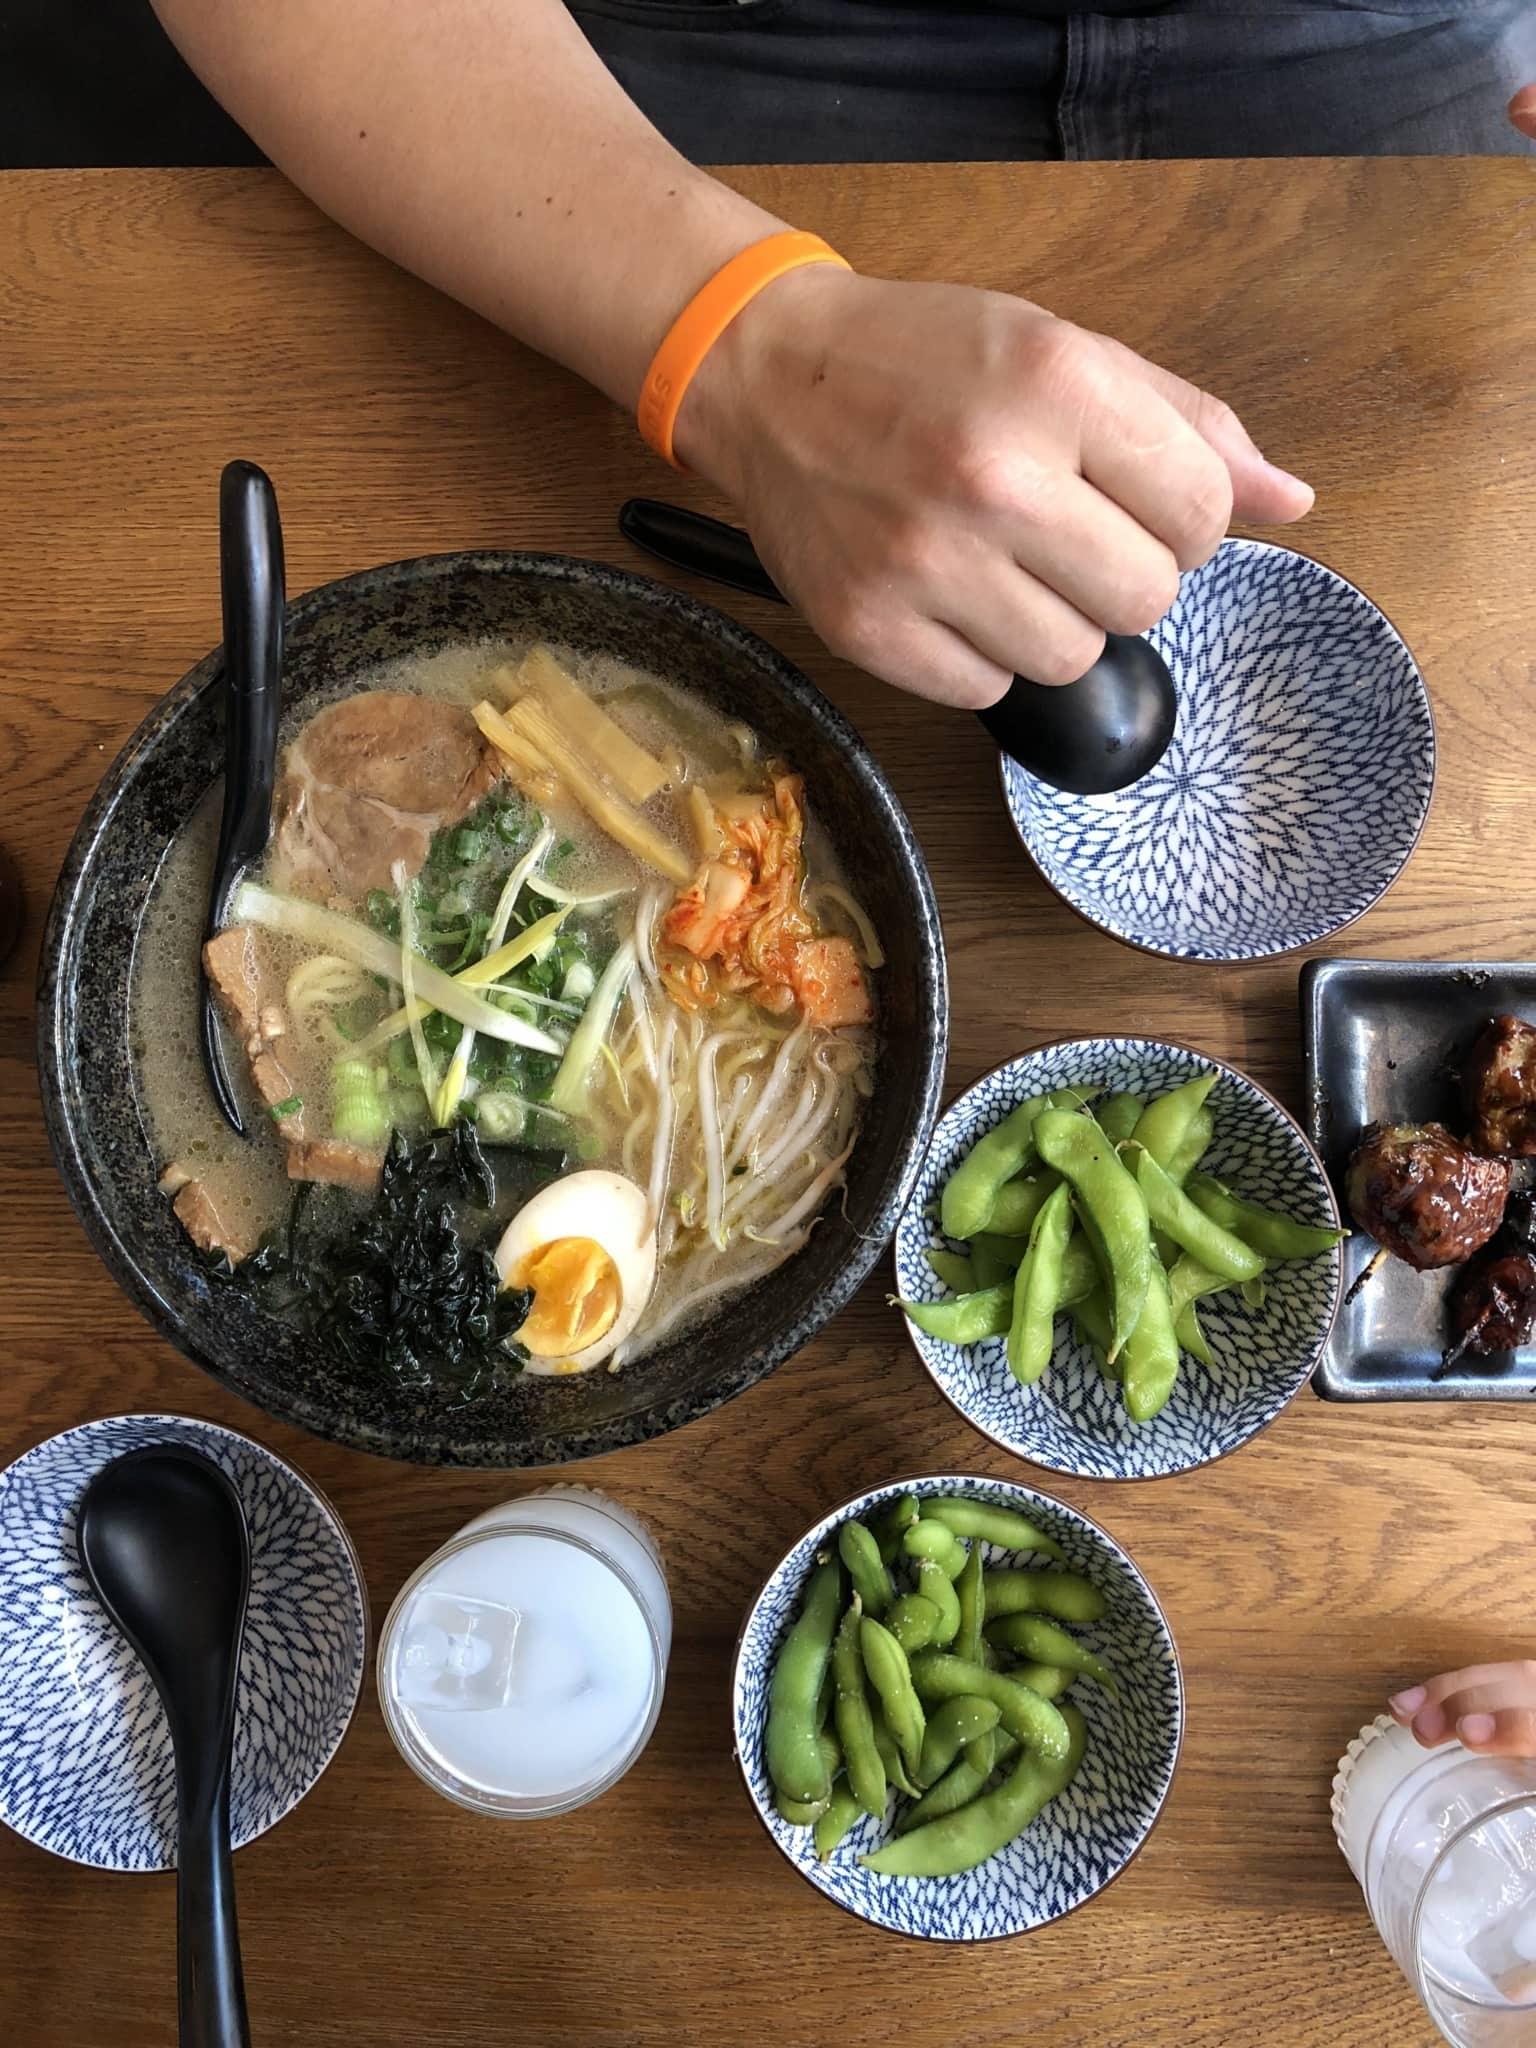 IMG 2808 e1525723409451 - Culinessa visits - Restaurant Taka Japanese Kitchen Amsterdam West